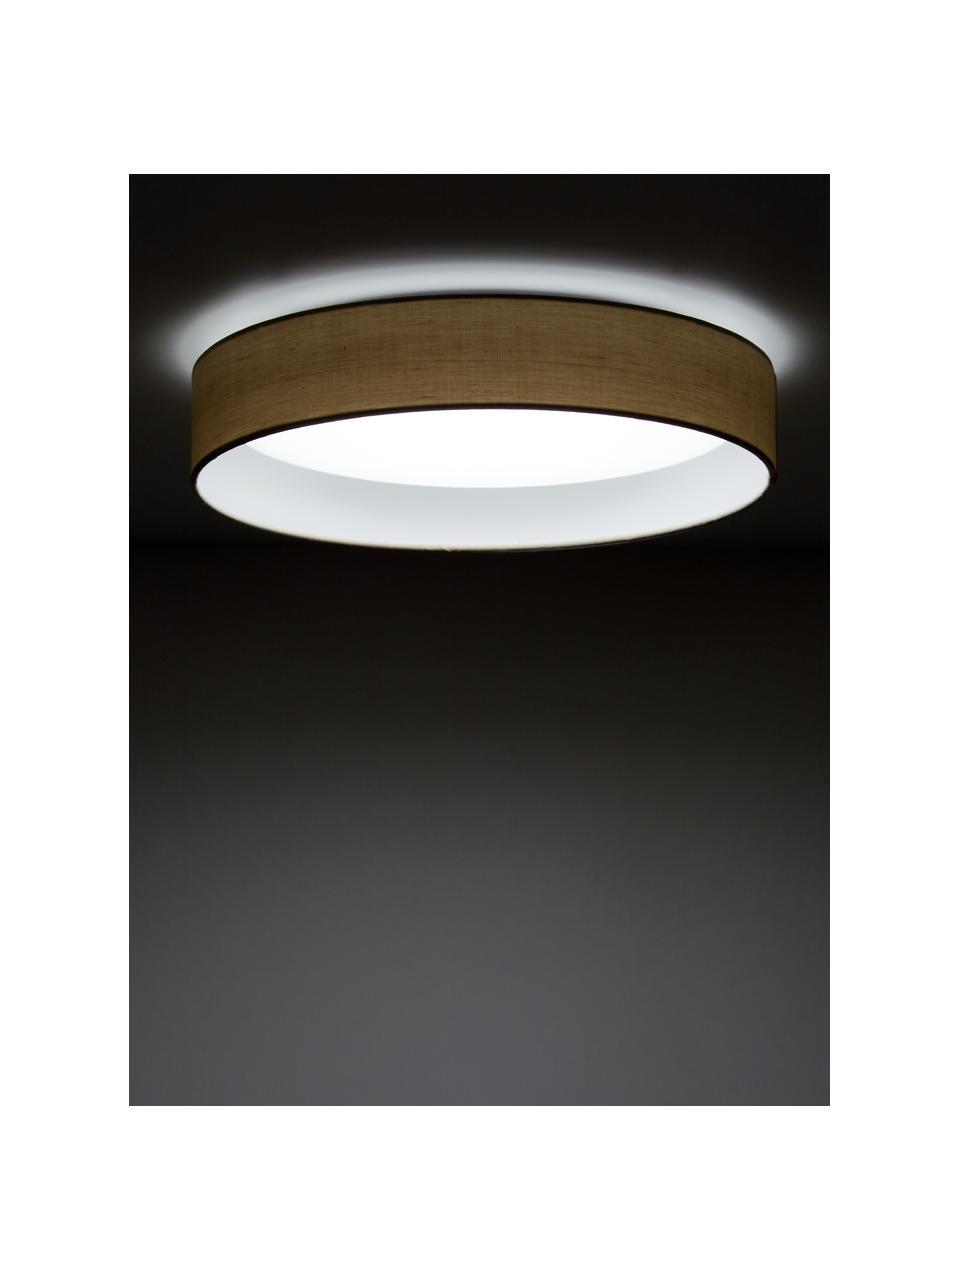 LED-plafondlamp Helen in taupe, Diffuser: kunststof, Taupe, Ø 52 x H 11 cm